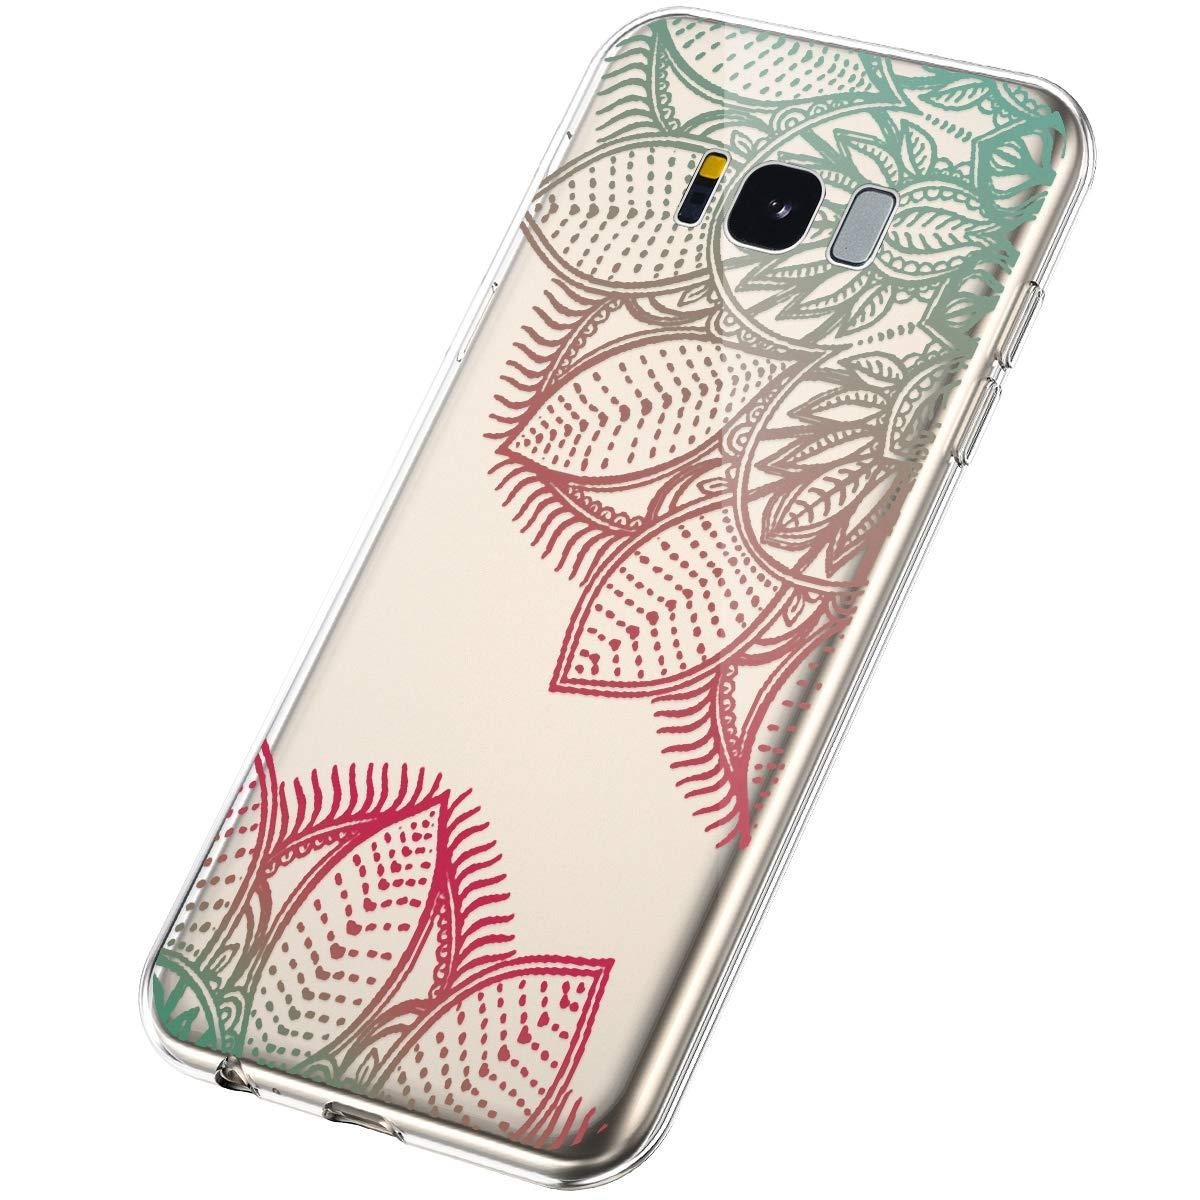 Coque Silicone Transparente Motif Mandala Ultra Slim Premium TPU Bumper Anti Choc Housse Etui Coque pour Samsung Galaxy S8-Dentelle Rose Pourpre SainCat Coque pour Galaxy S8